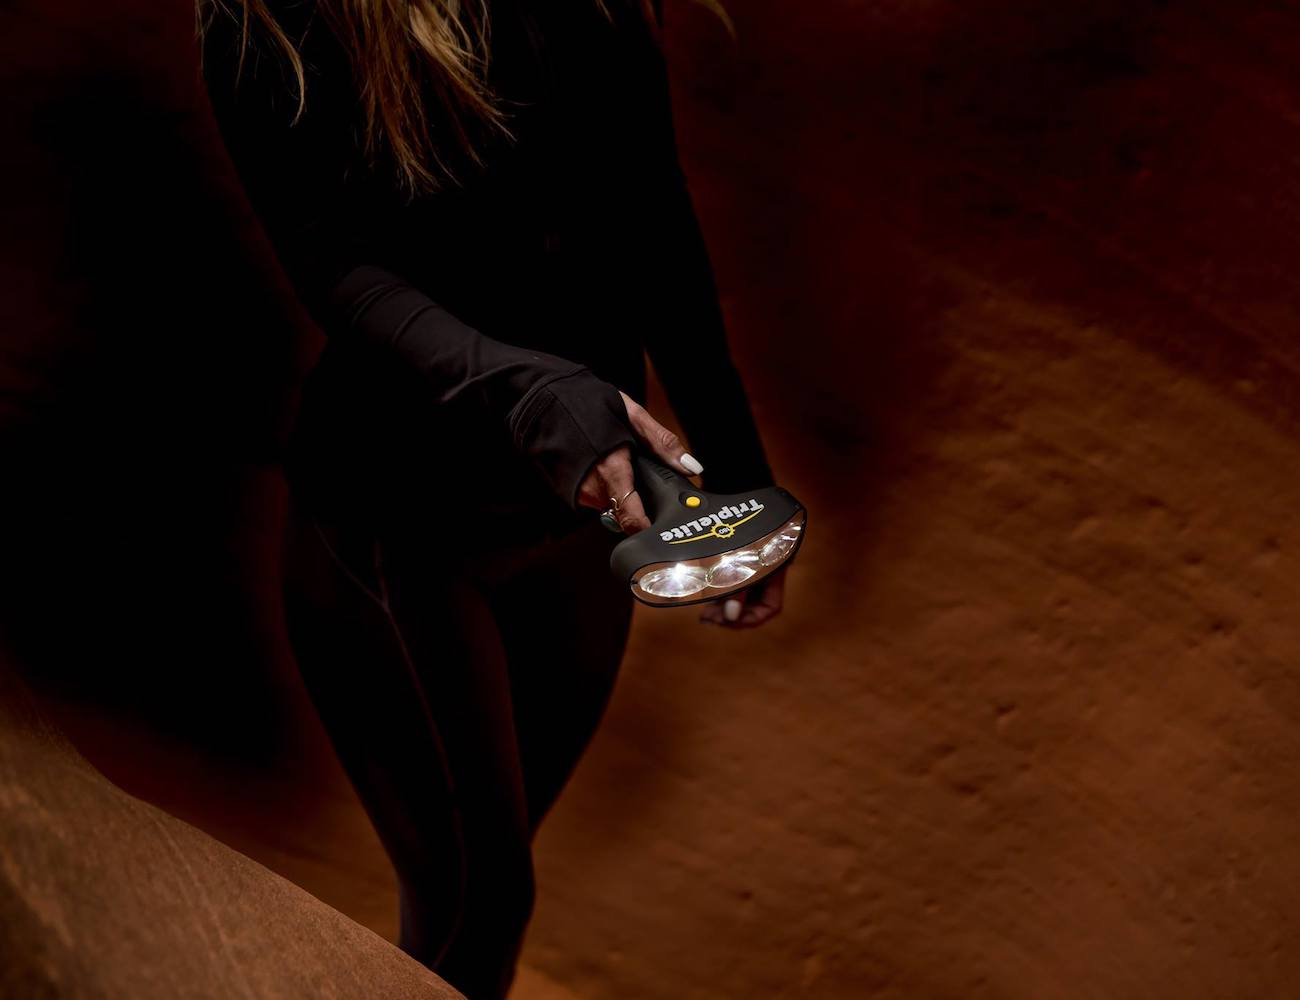 TripleLite Master T 180°-Beam Flashlight provides more than 8 hours of brightness